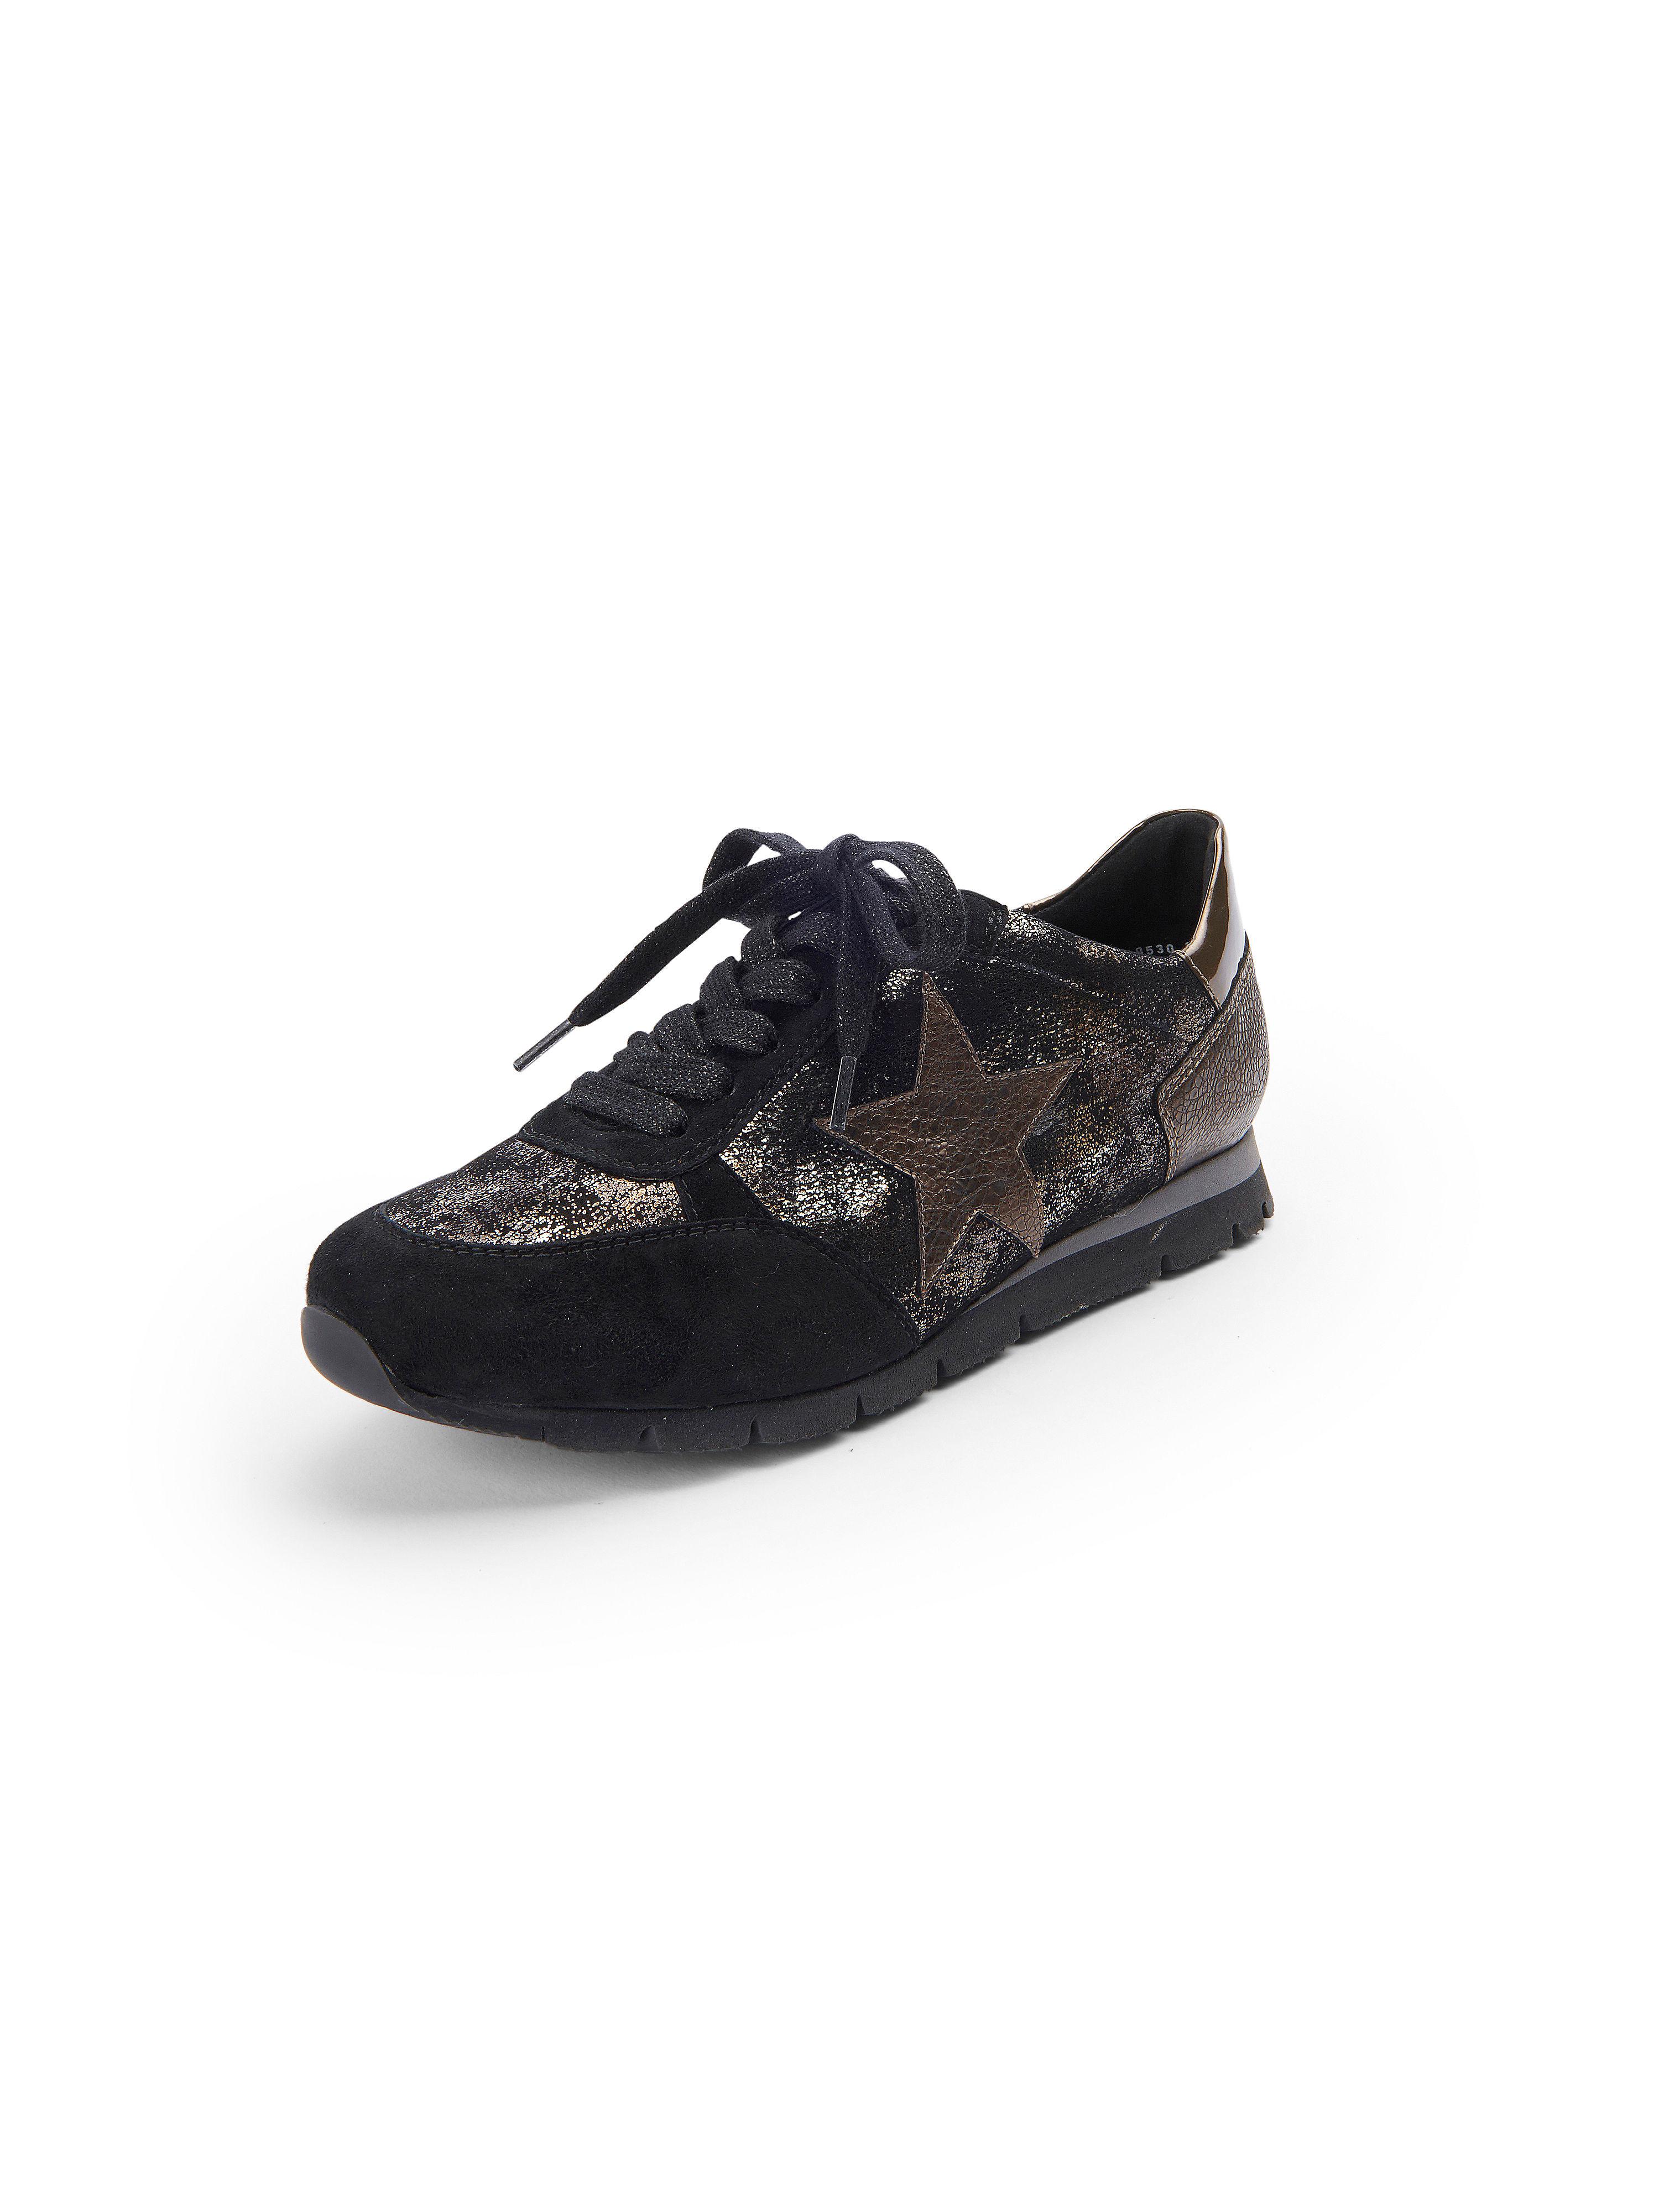 Sneakers, model Rosa Van Semler zwart